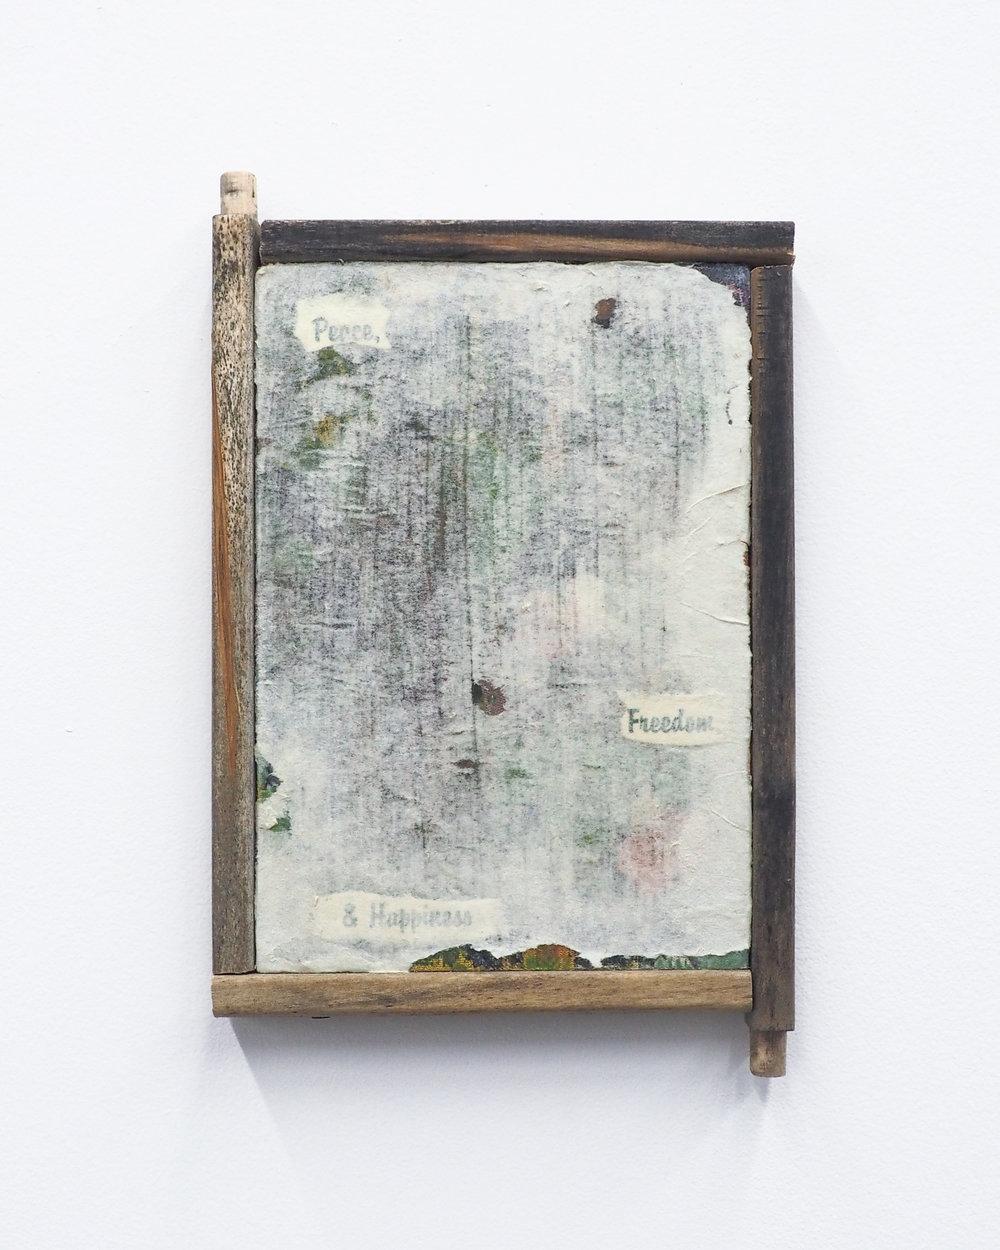 "Garrett Lockhart,  Peace, Freedom, Happiness , 2018, laserprint on tie-dyed cotton, evangelist pamphlet, recycled newsprint, salvaged wood 6"" x 8"""